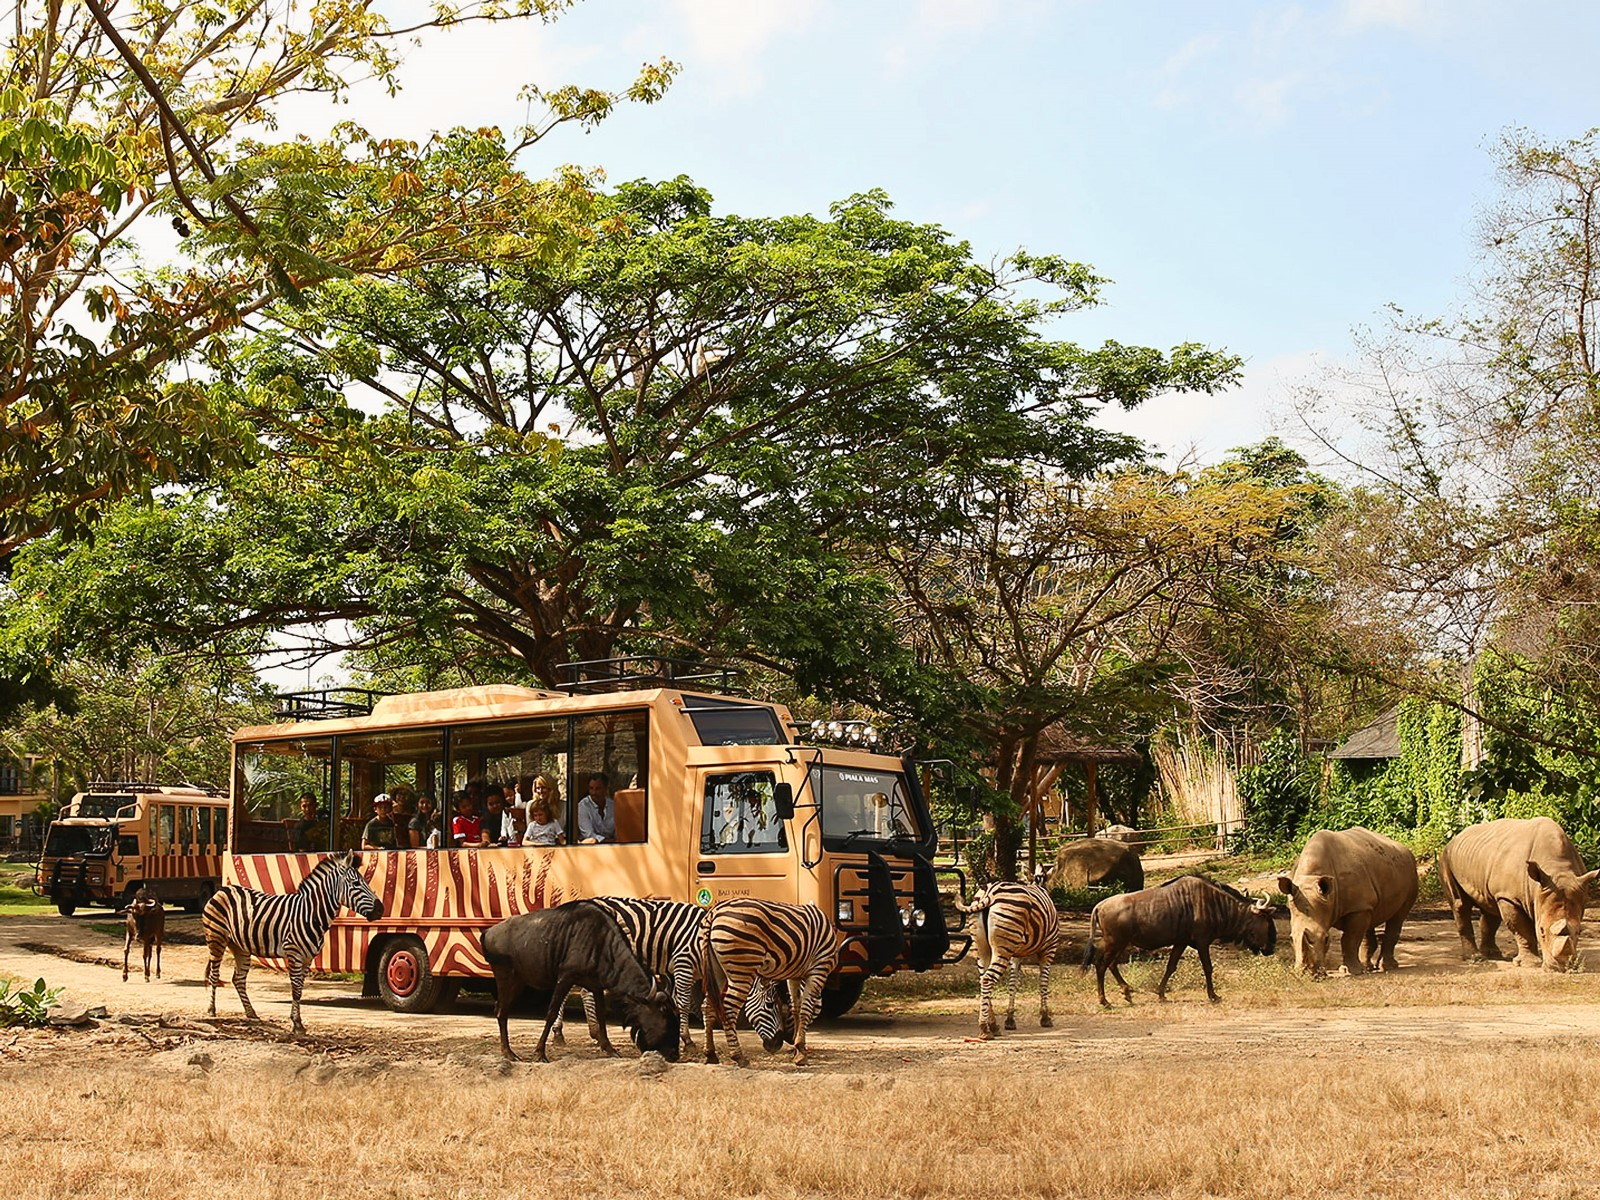 26% Off Bali Safari and Marine Park Tickets - Wandernesia